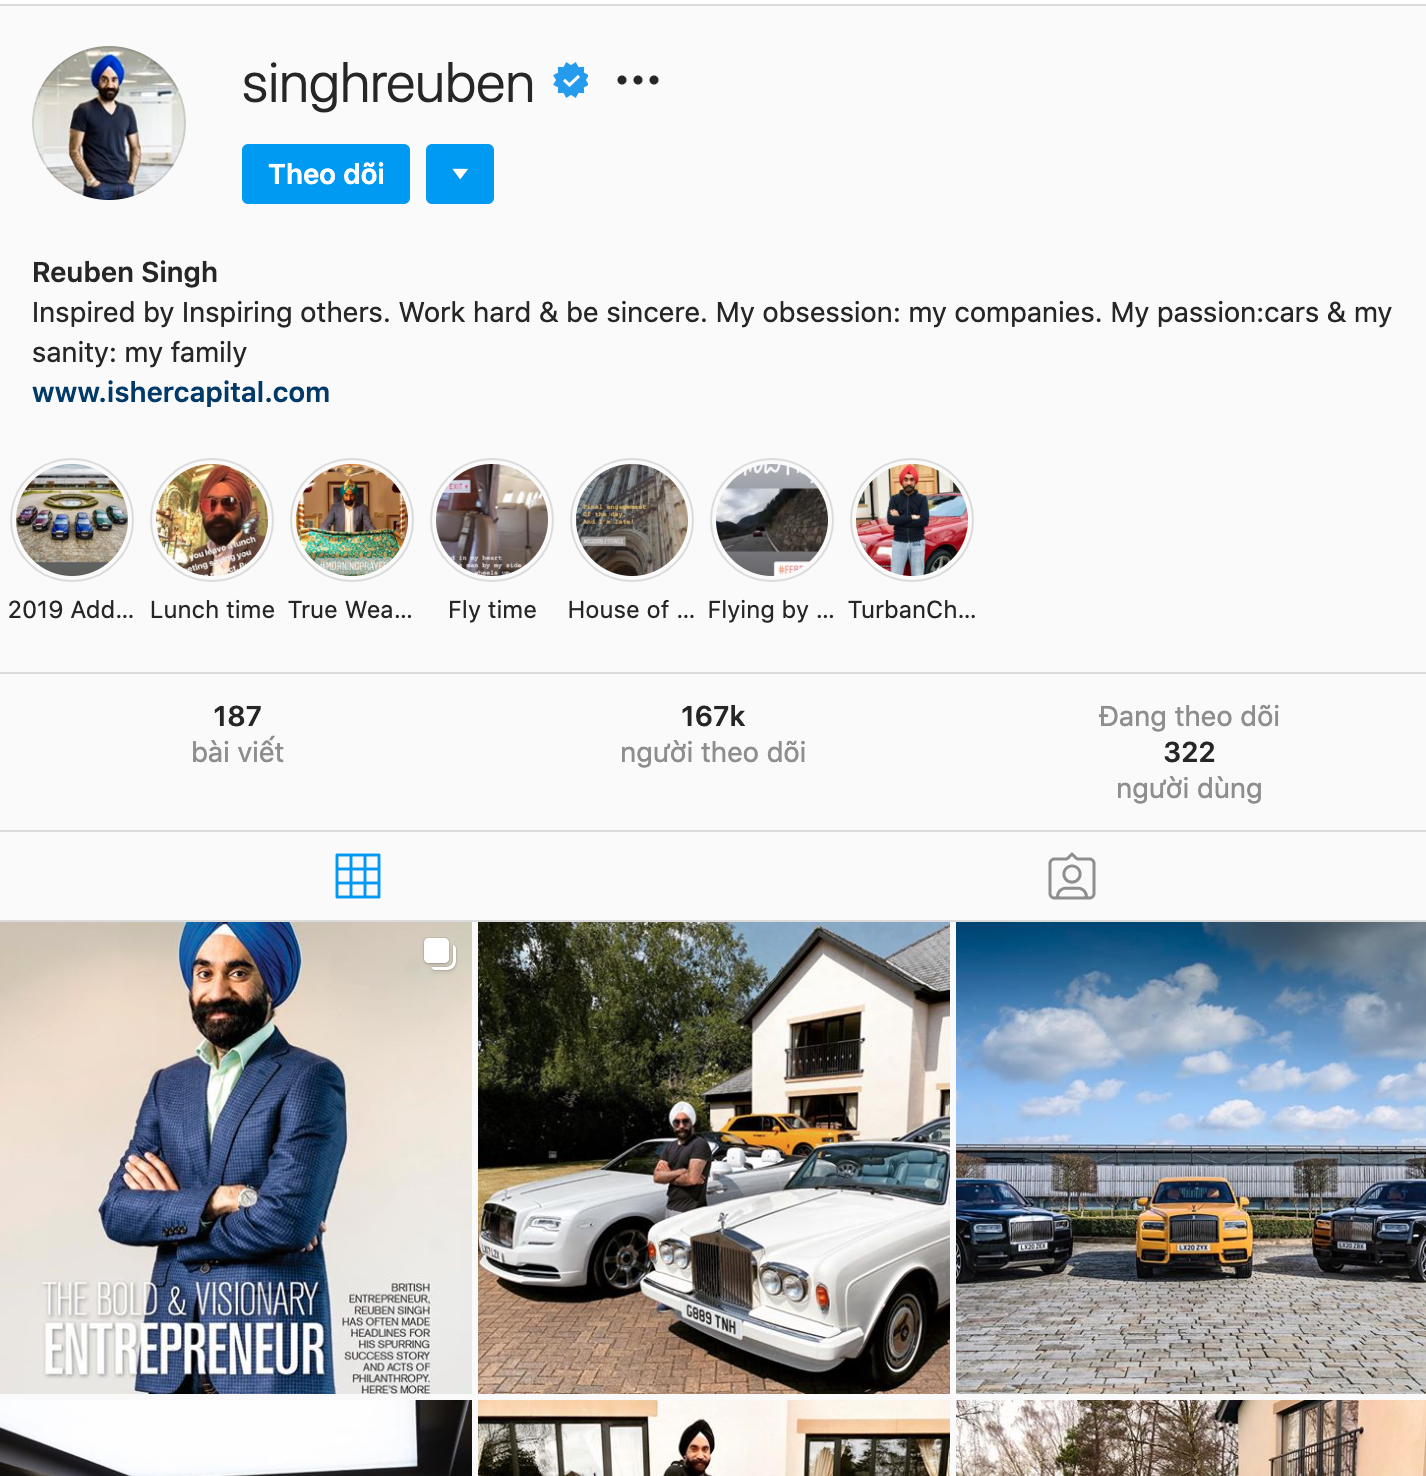 Tai-khoan-Instagram-cua-Forex-trader-dang-theo-doi-nhat-TraderViet13.